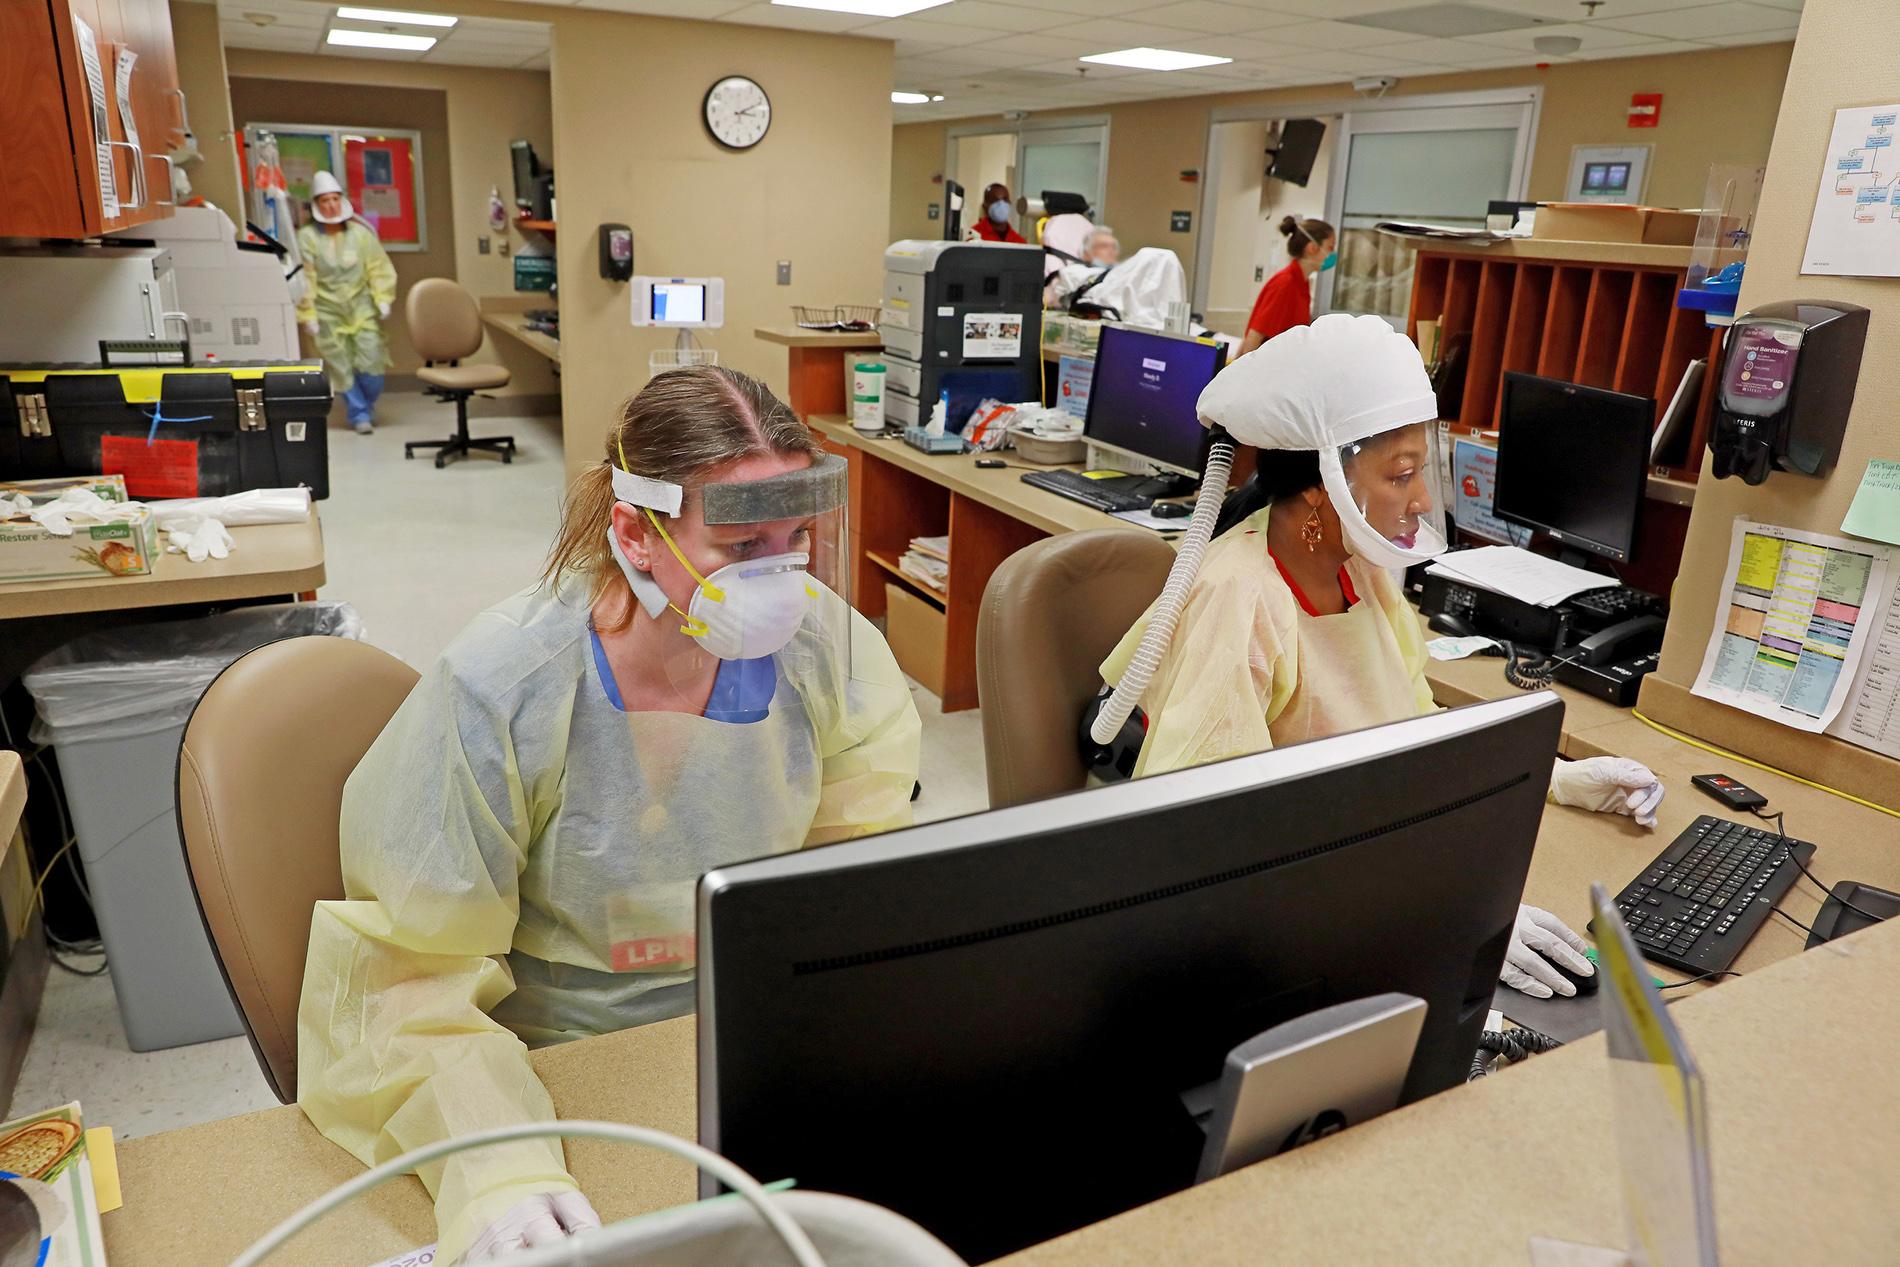 Nurses in COVID protective gear